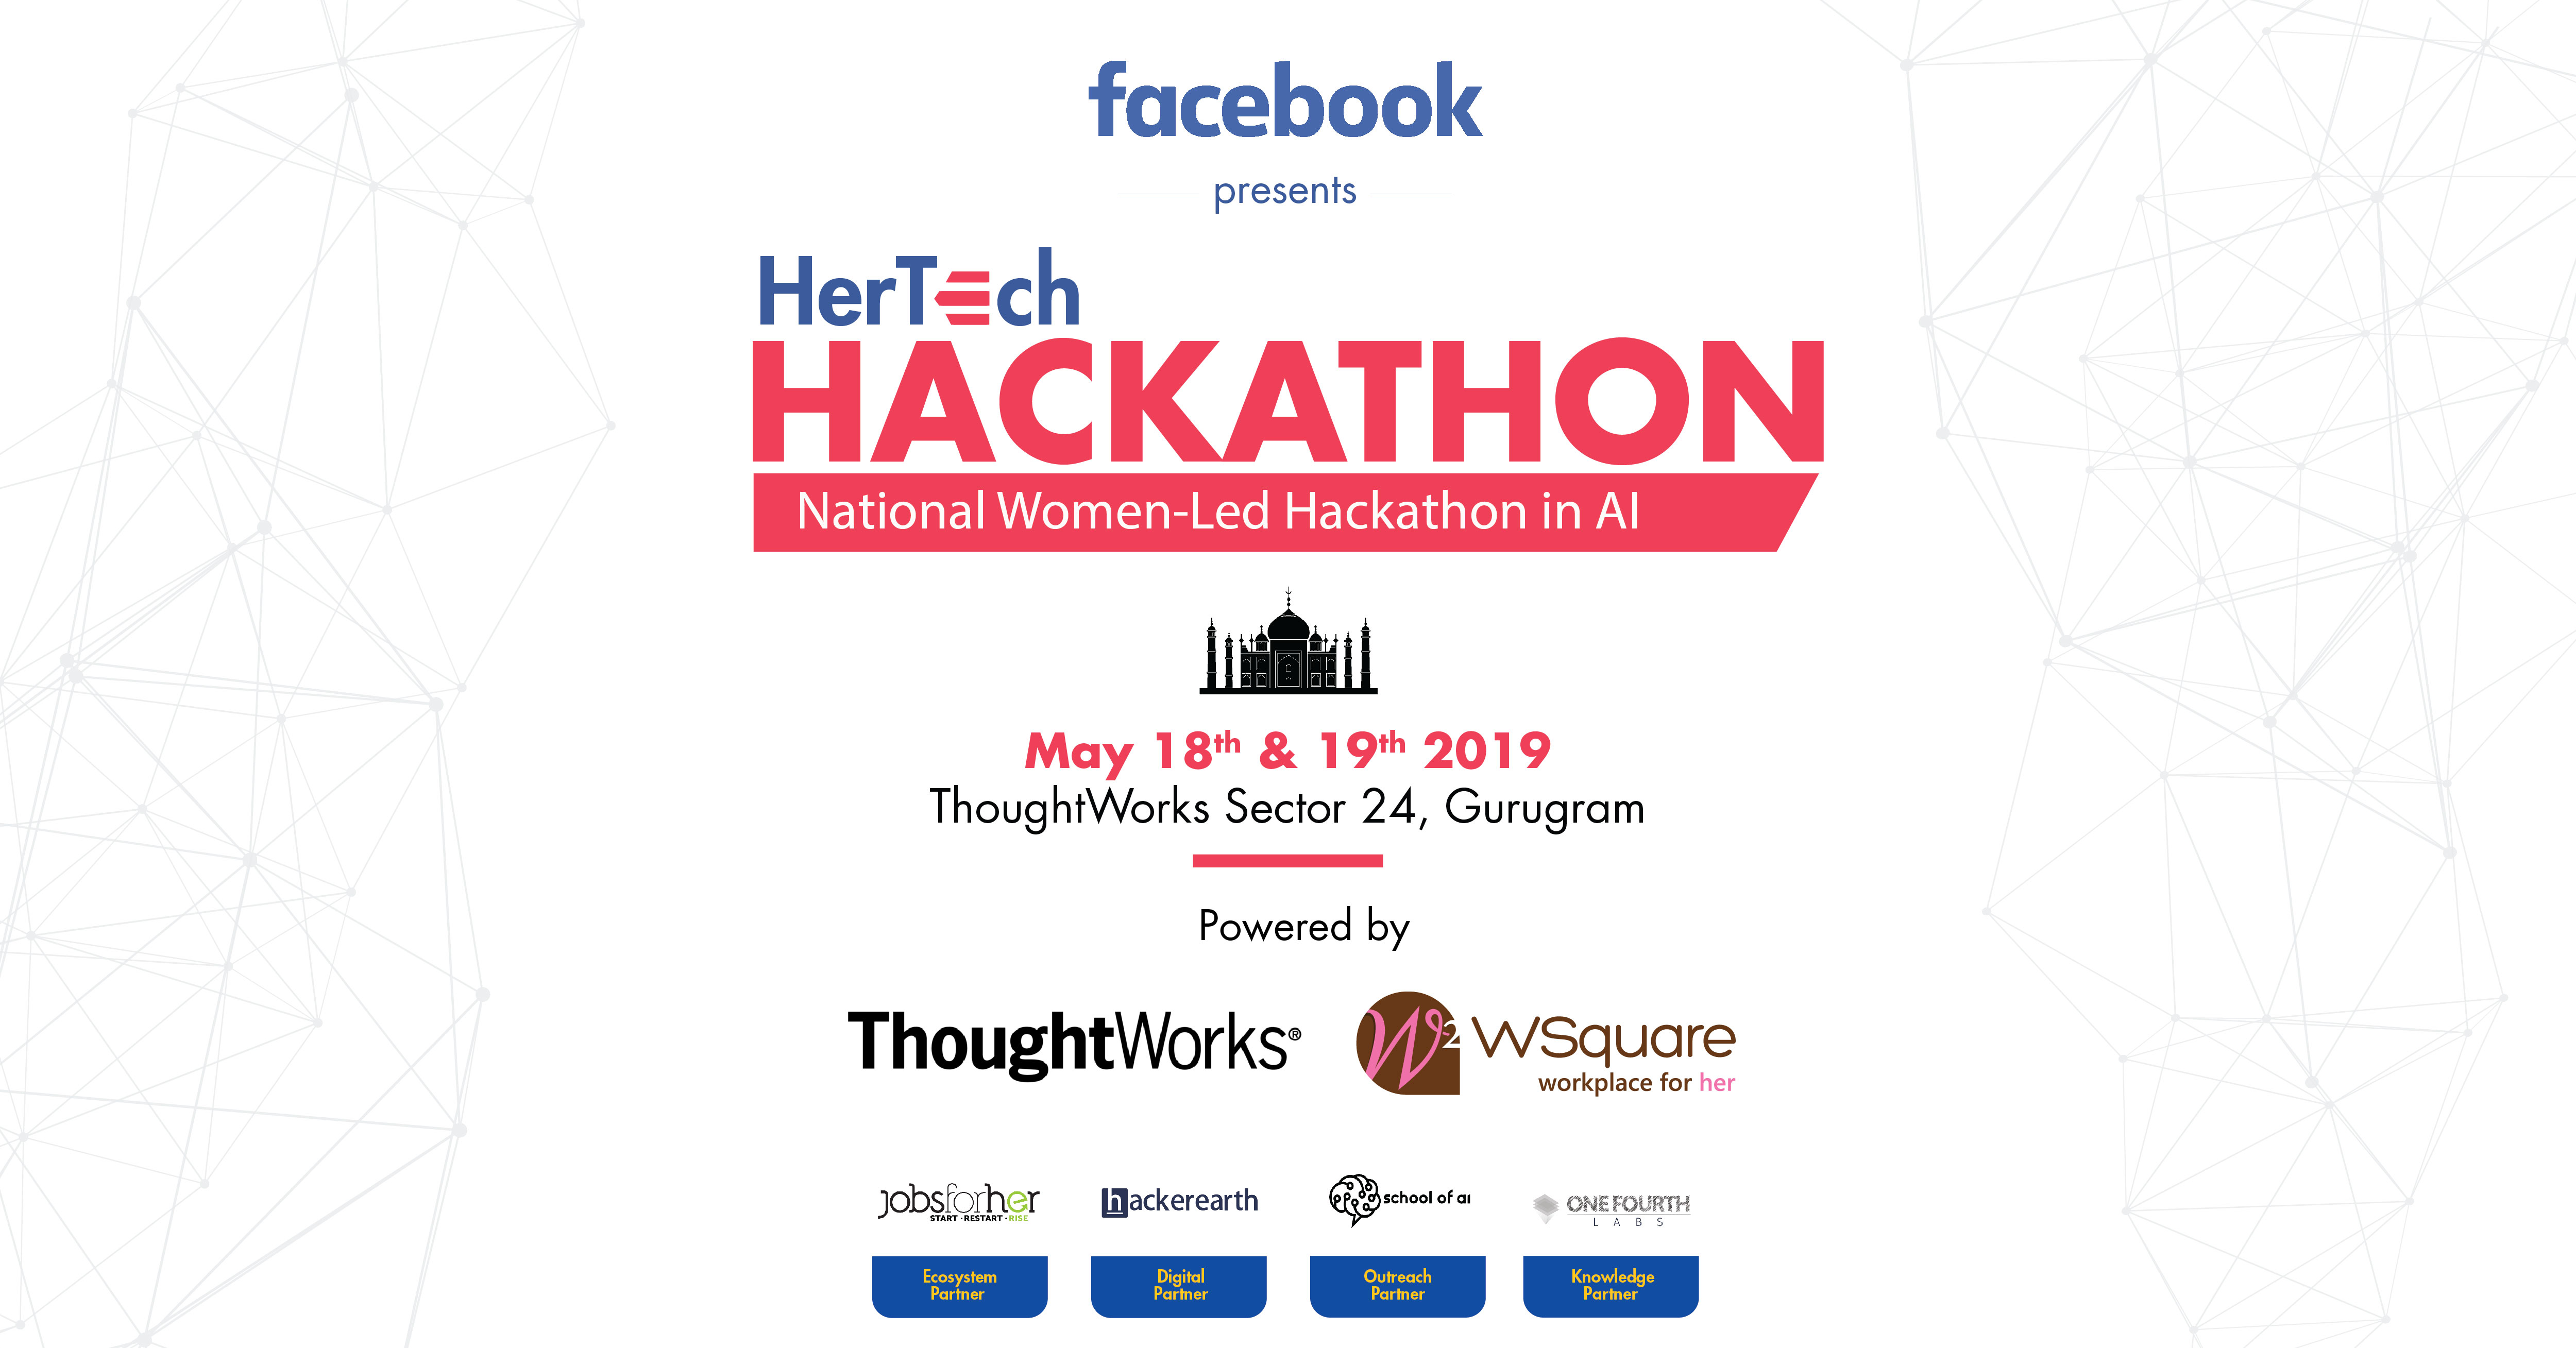 hertech-hackathon-in-ai